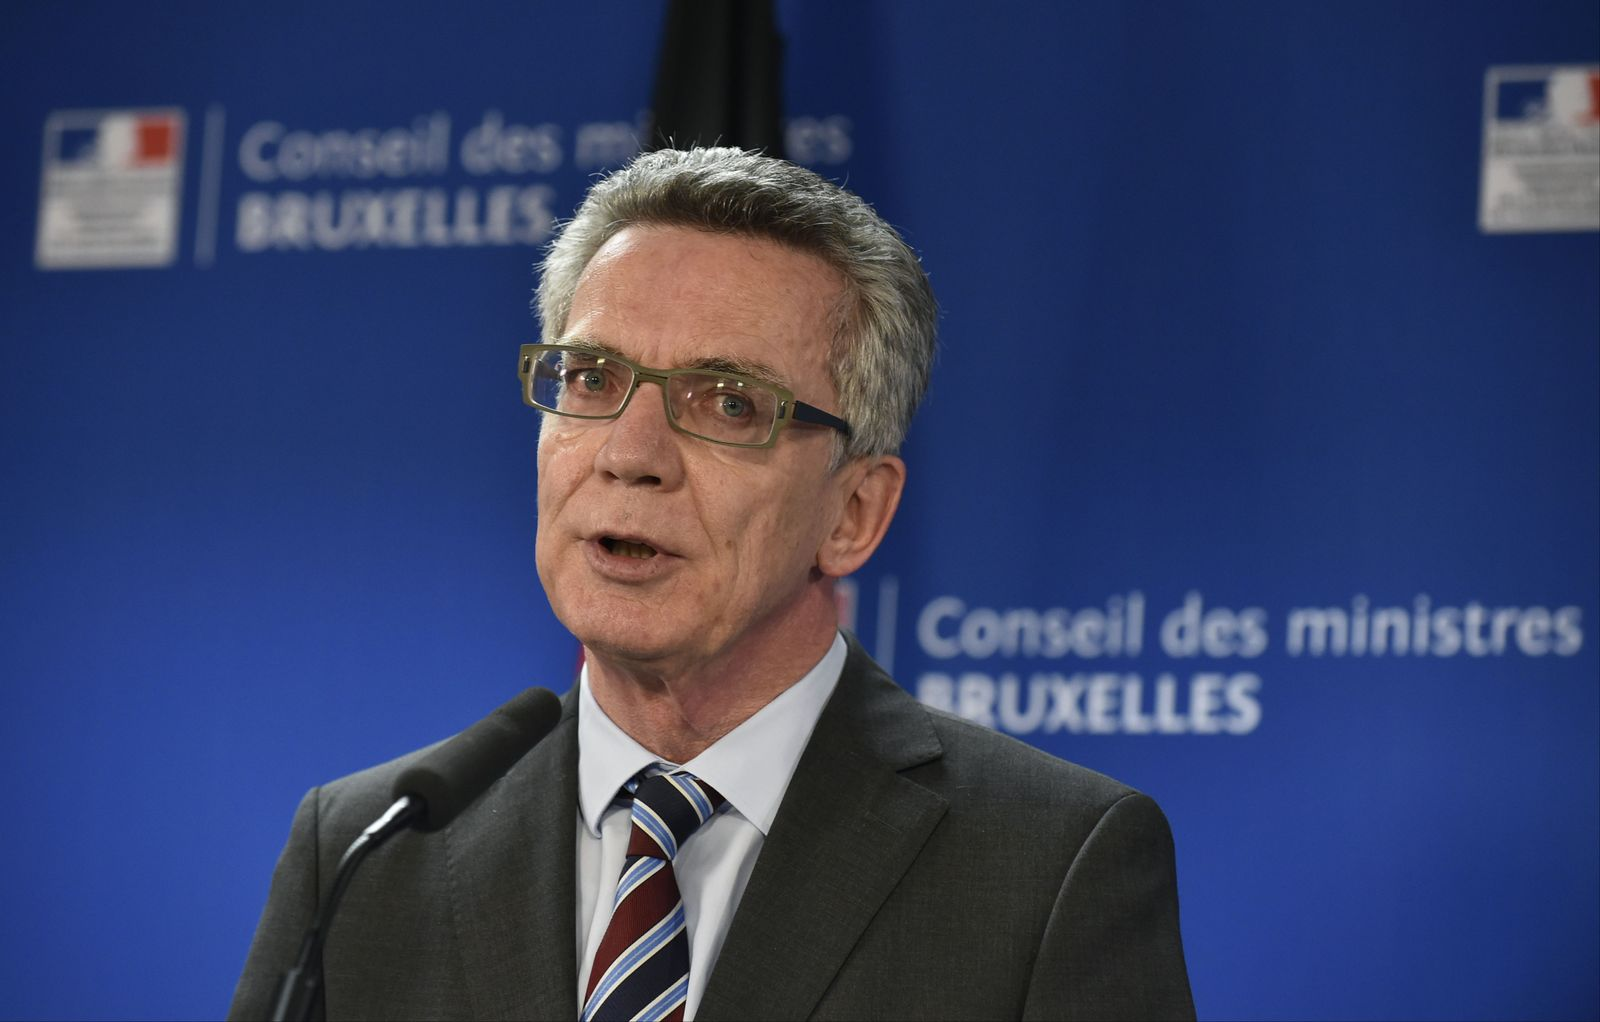 BELGIUM-EU-POLITICS-MEETING